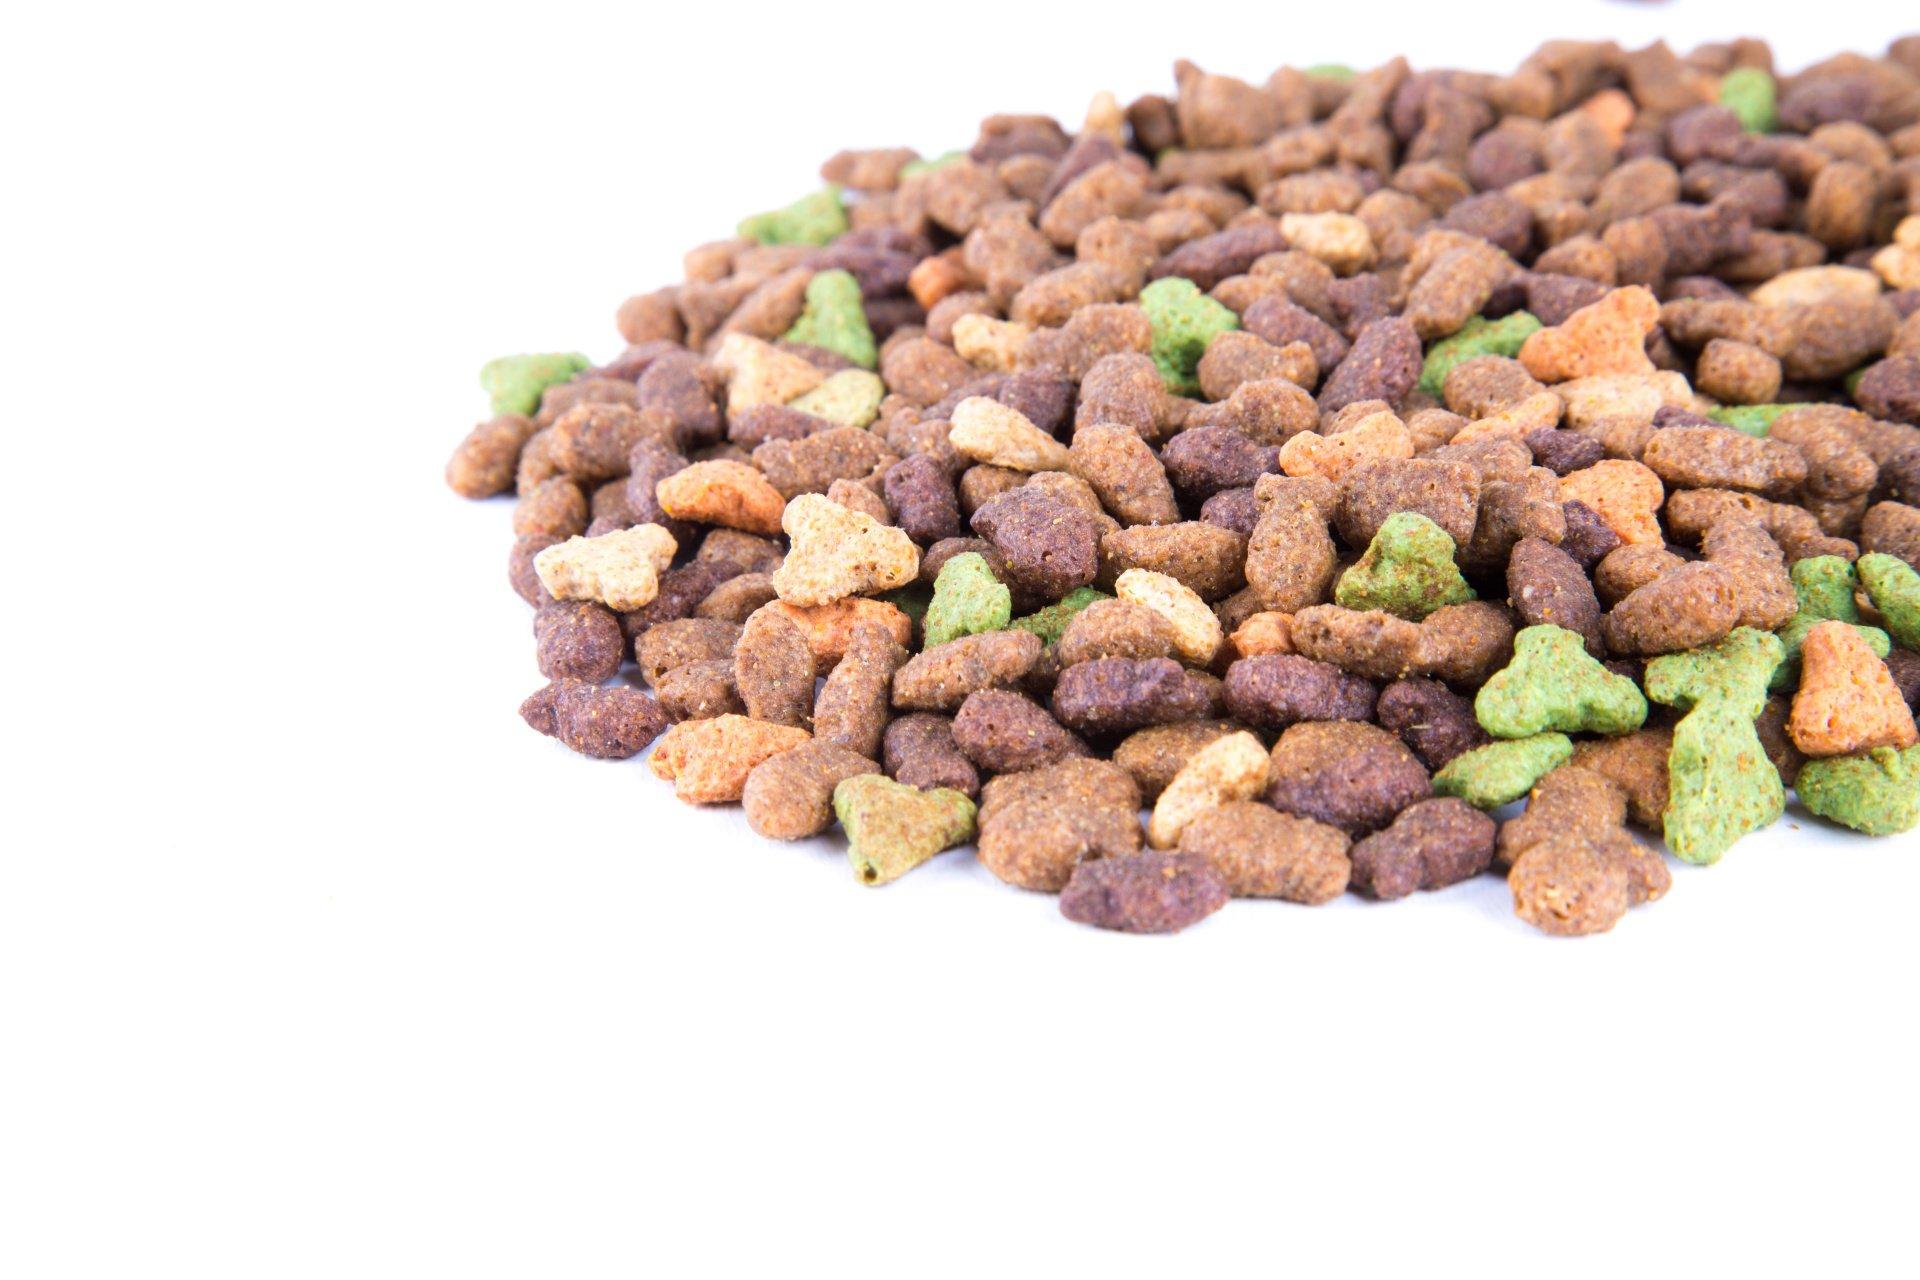 dry-cat-food-1467385948l8v.jpg